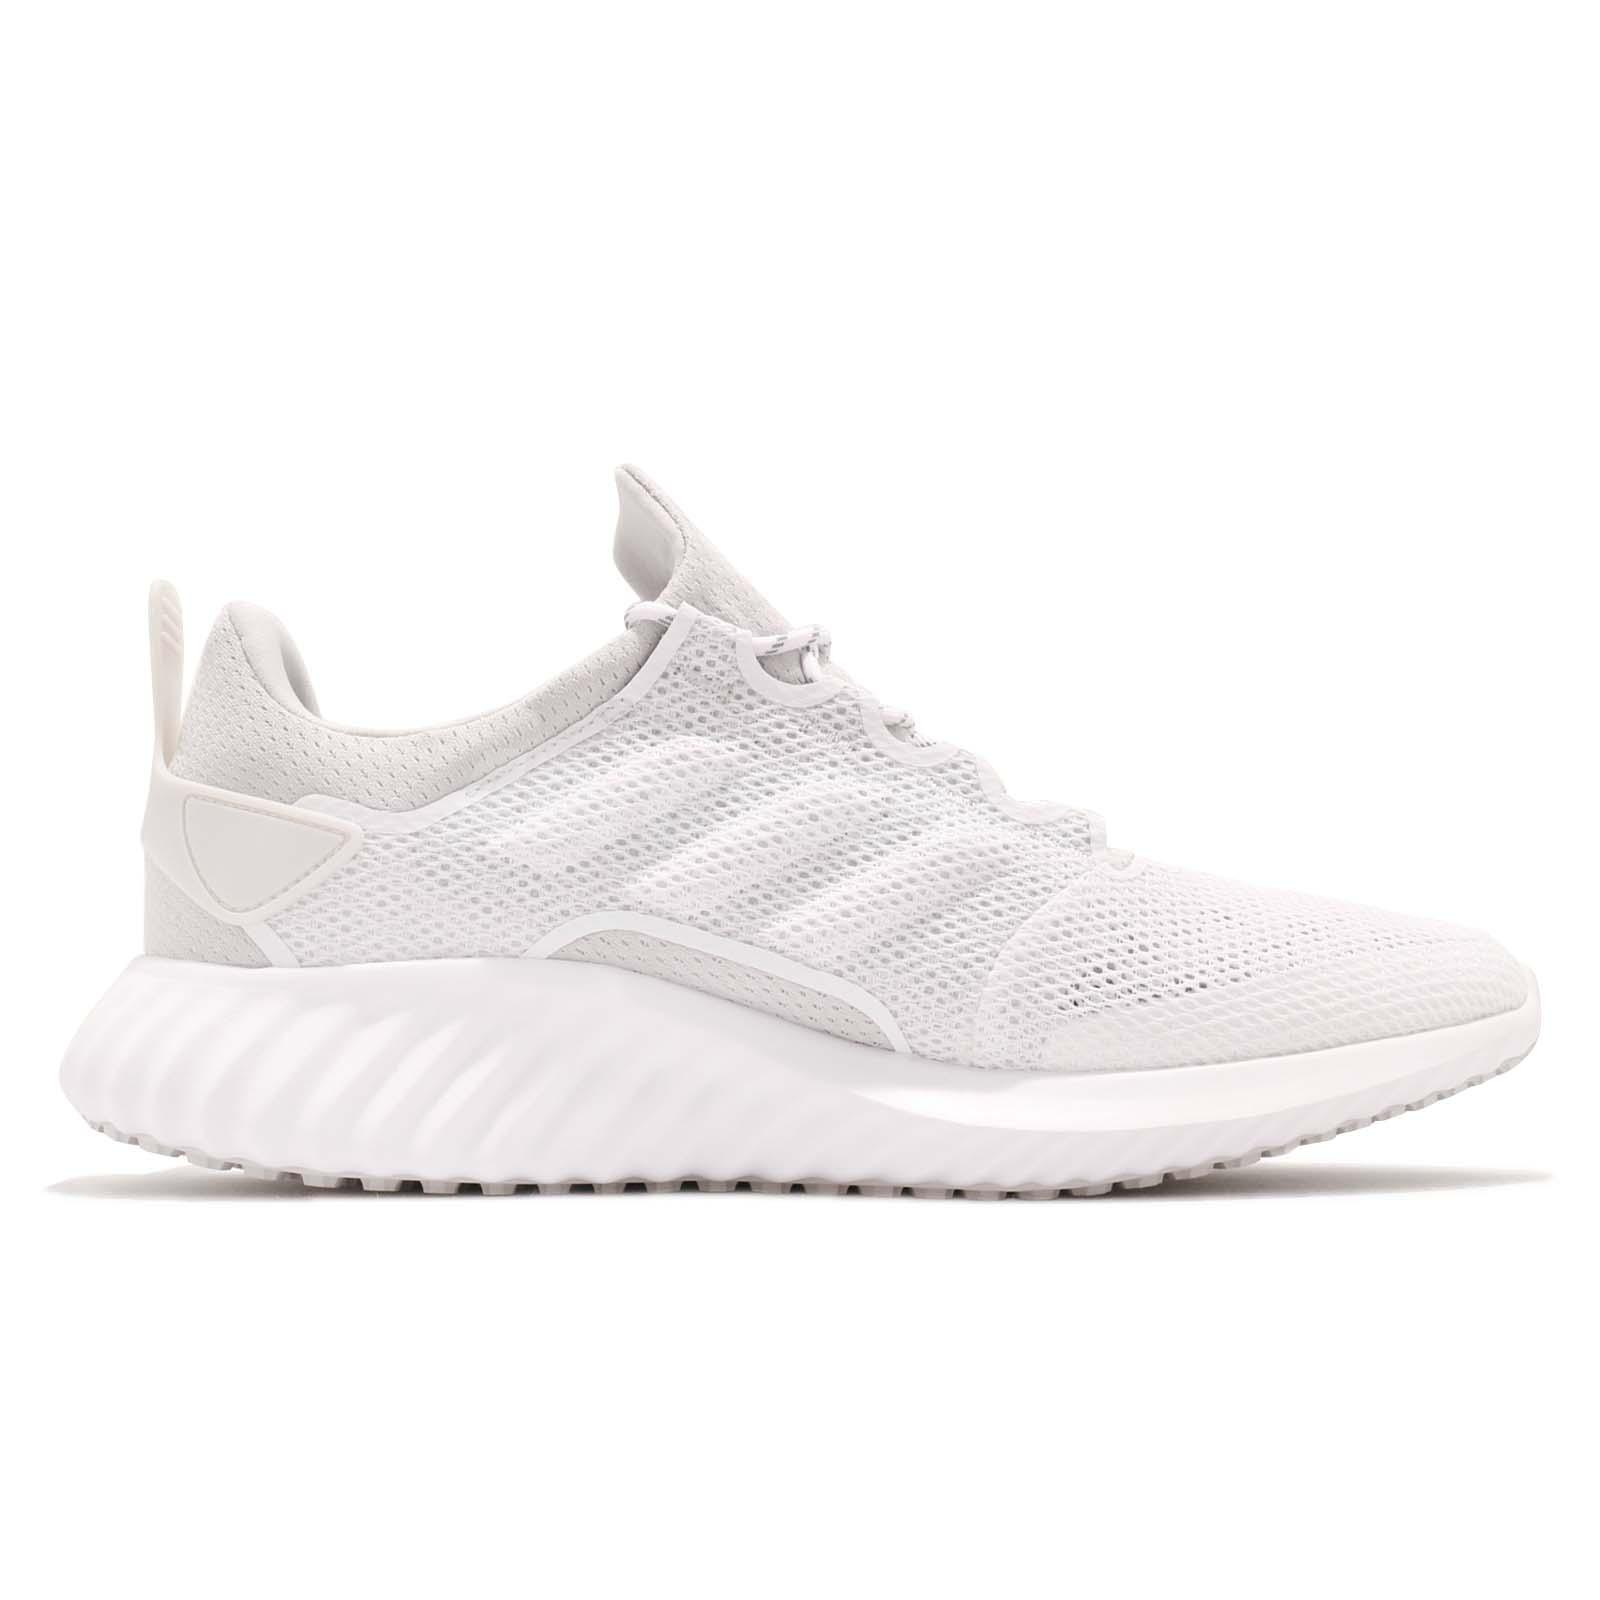 4a10fe586 adidas AlphaBounce CR CC M White City Run Clima Grey Men Running ...